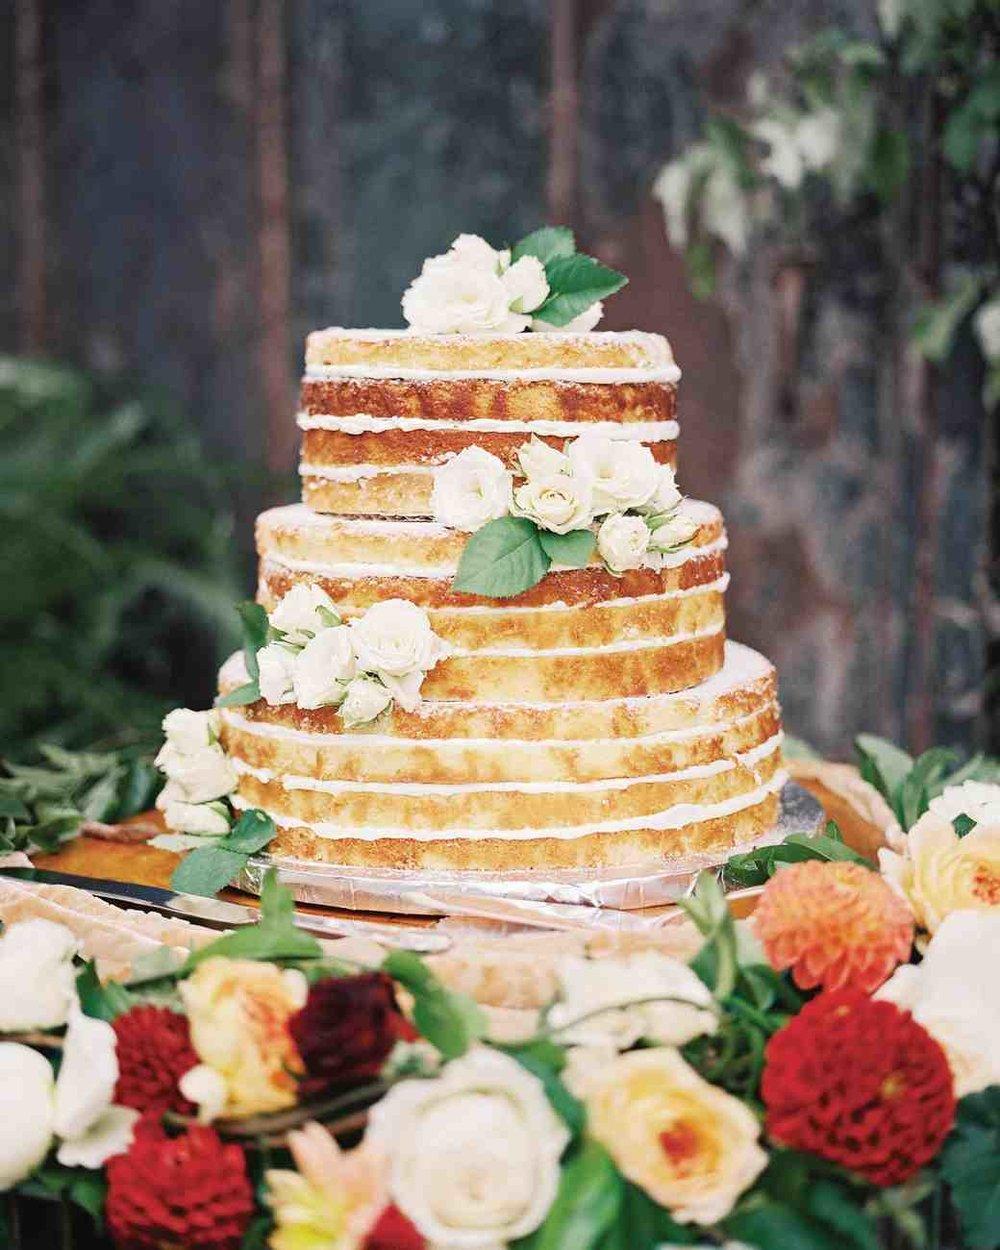 stephanie-mike-wedding-north-carolina-naked-cake-flowers-75-s112048_vert.jpg